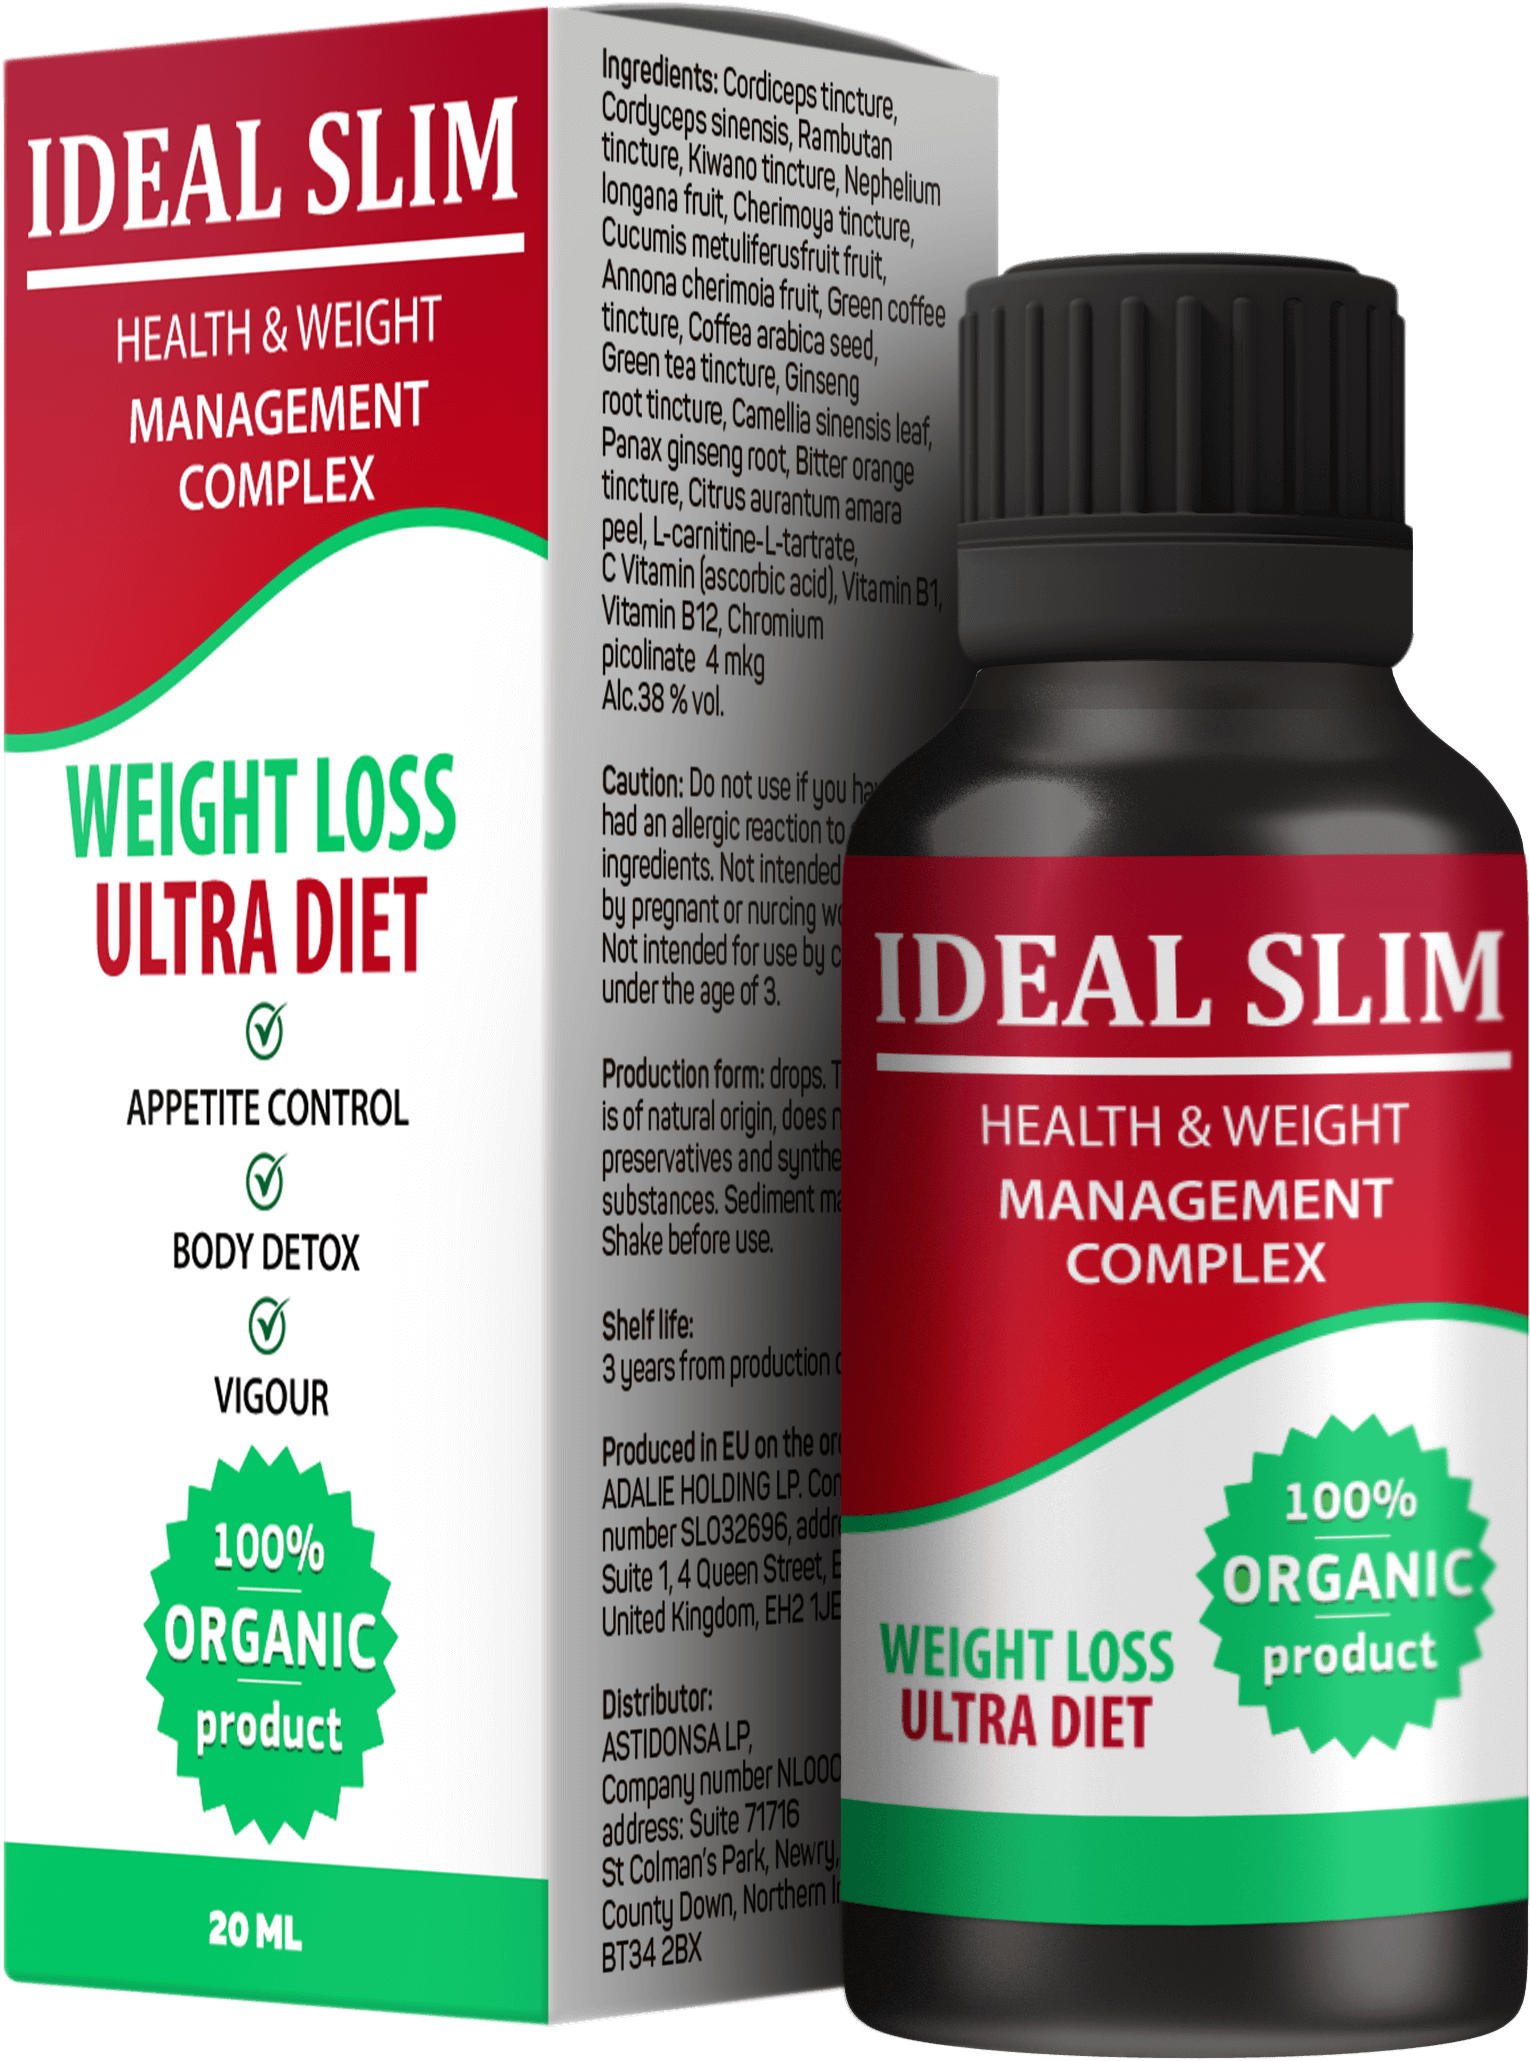 Ideal Slim picaturi – comentarii negative, opinii, pret, site-ul oficial